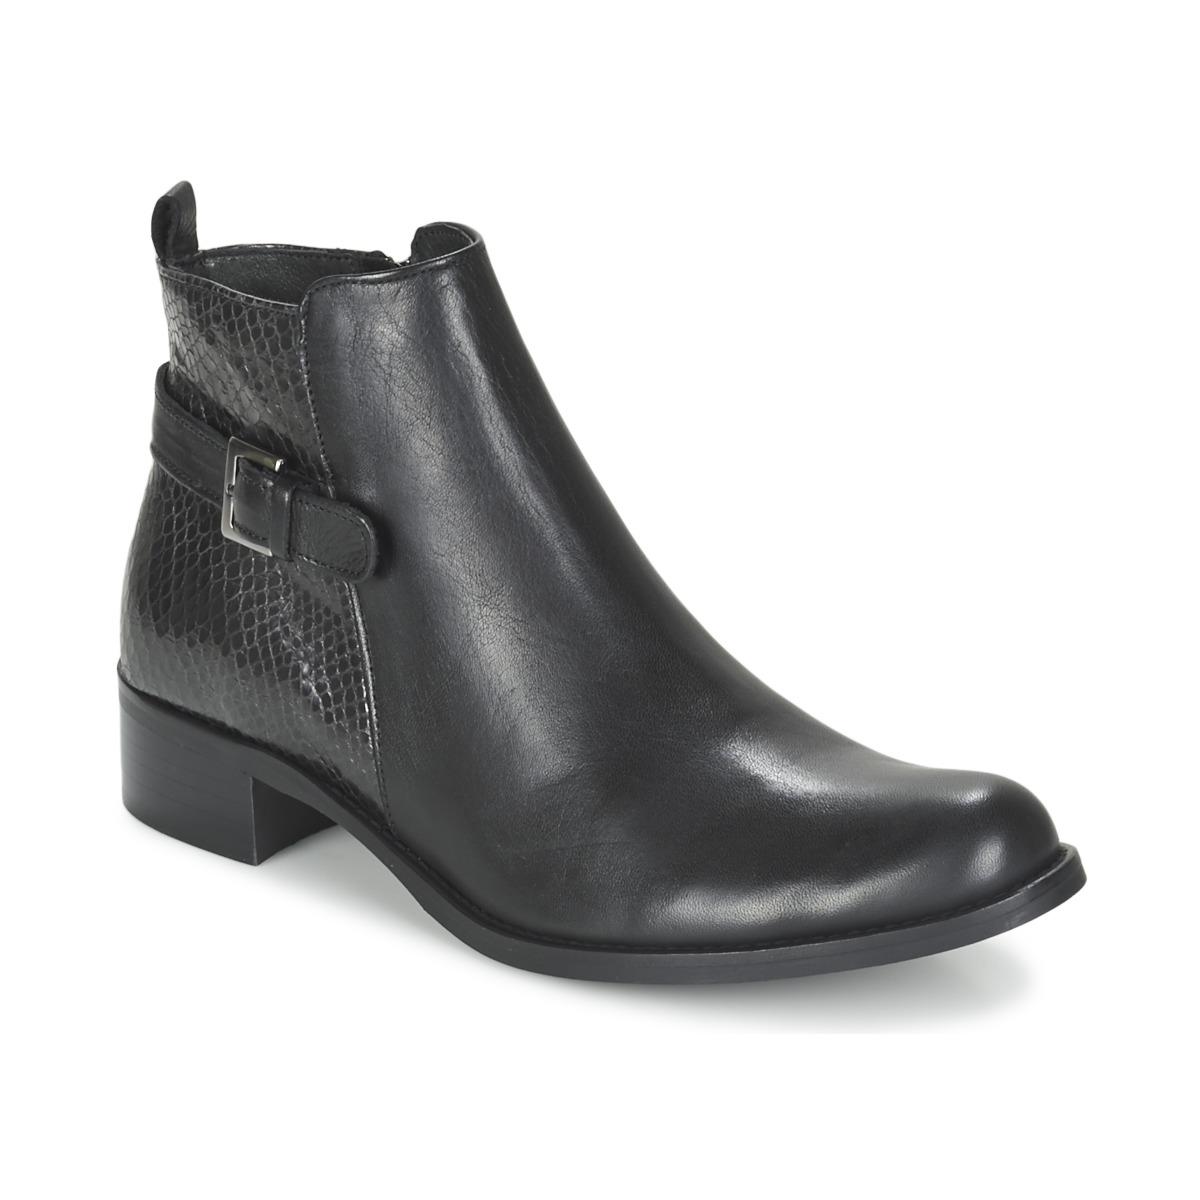 Betty London FEWIS Schwarz - Kostenloser Versand bei Spartoode ! - Schuhe Boots Damen 69,00 €